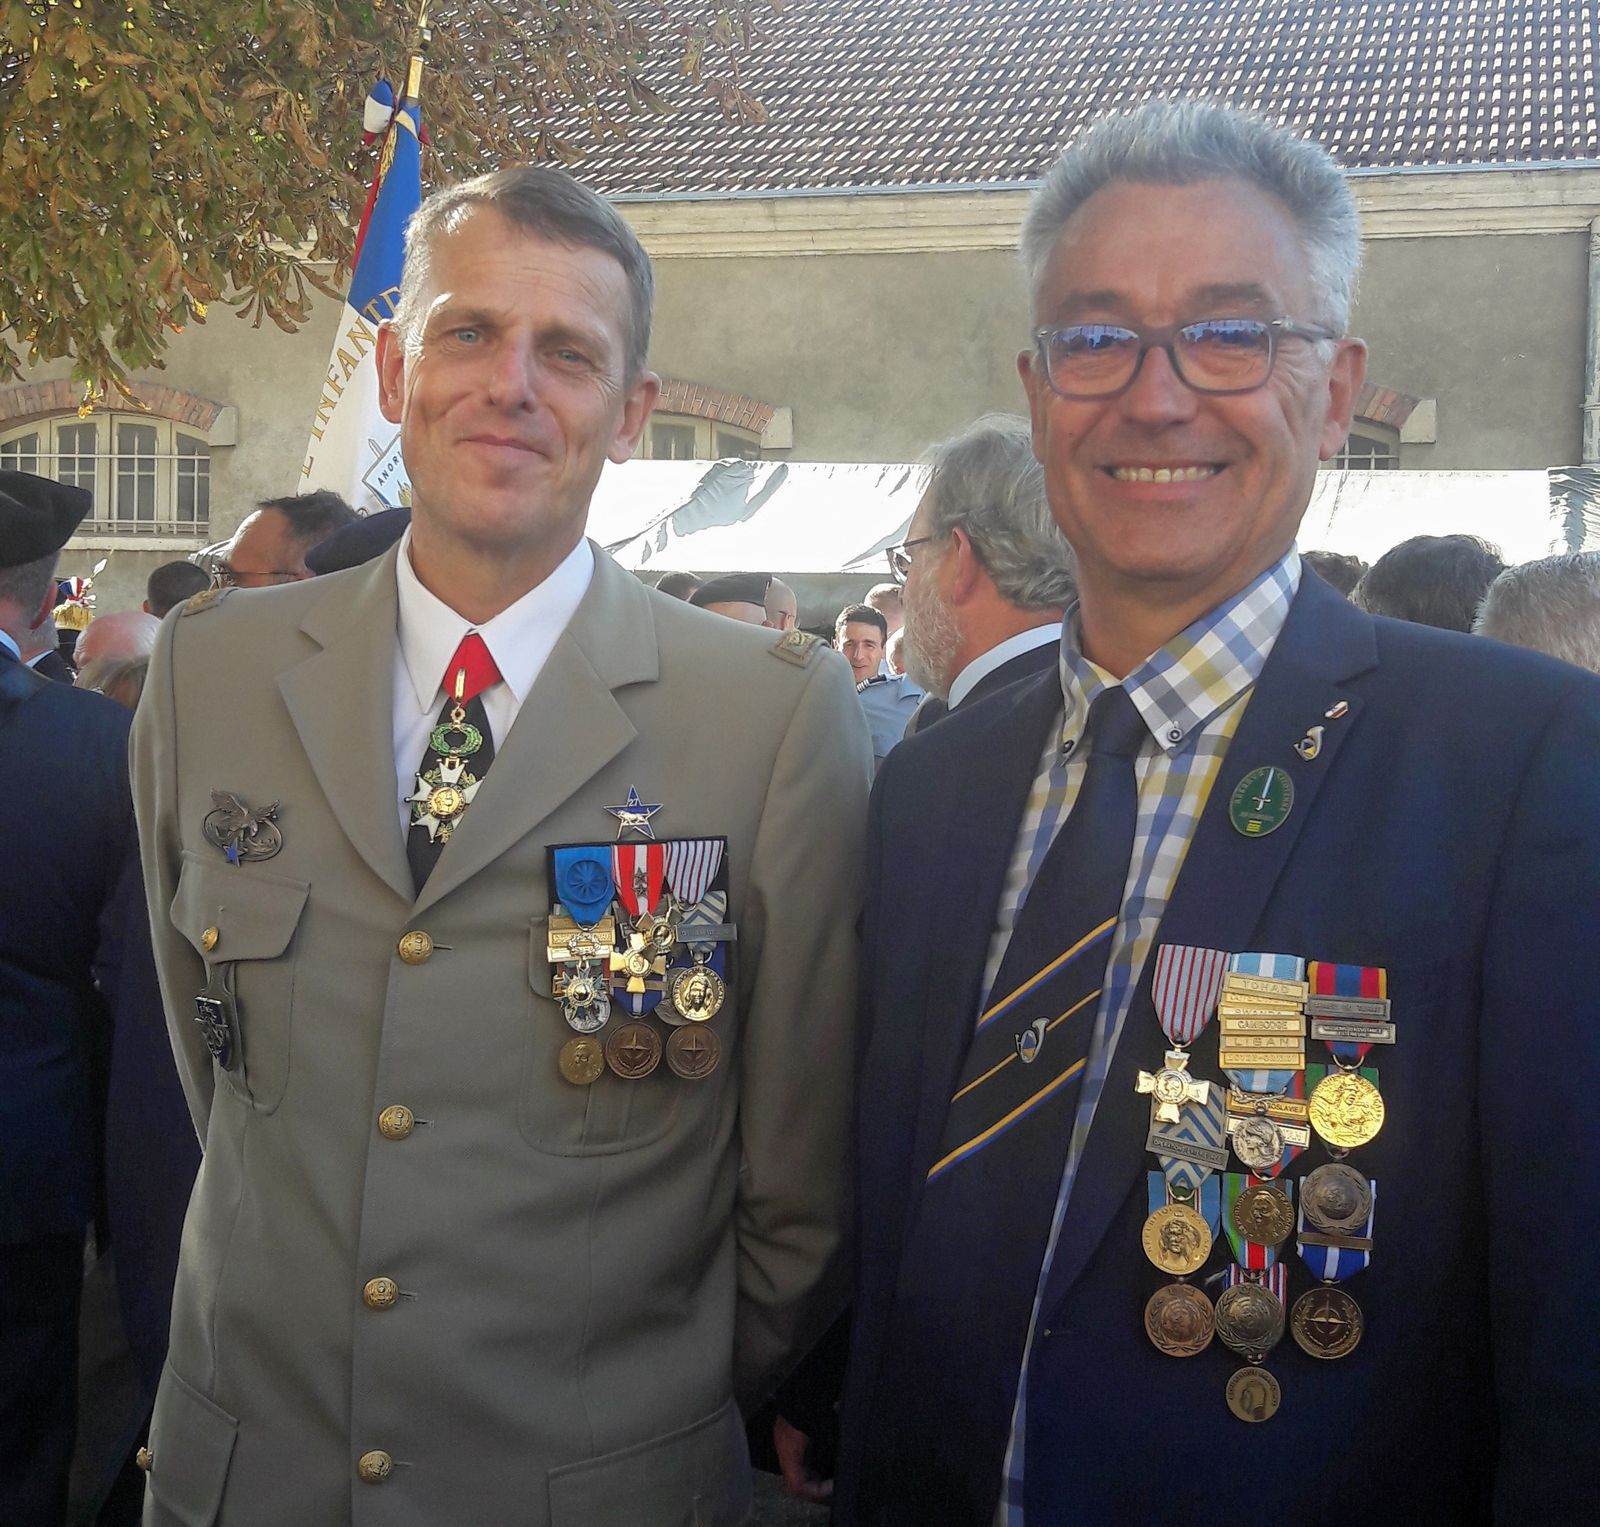 Sidi Brahim Nationale 2019